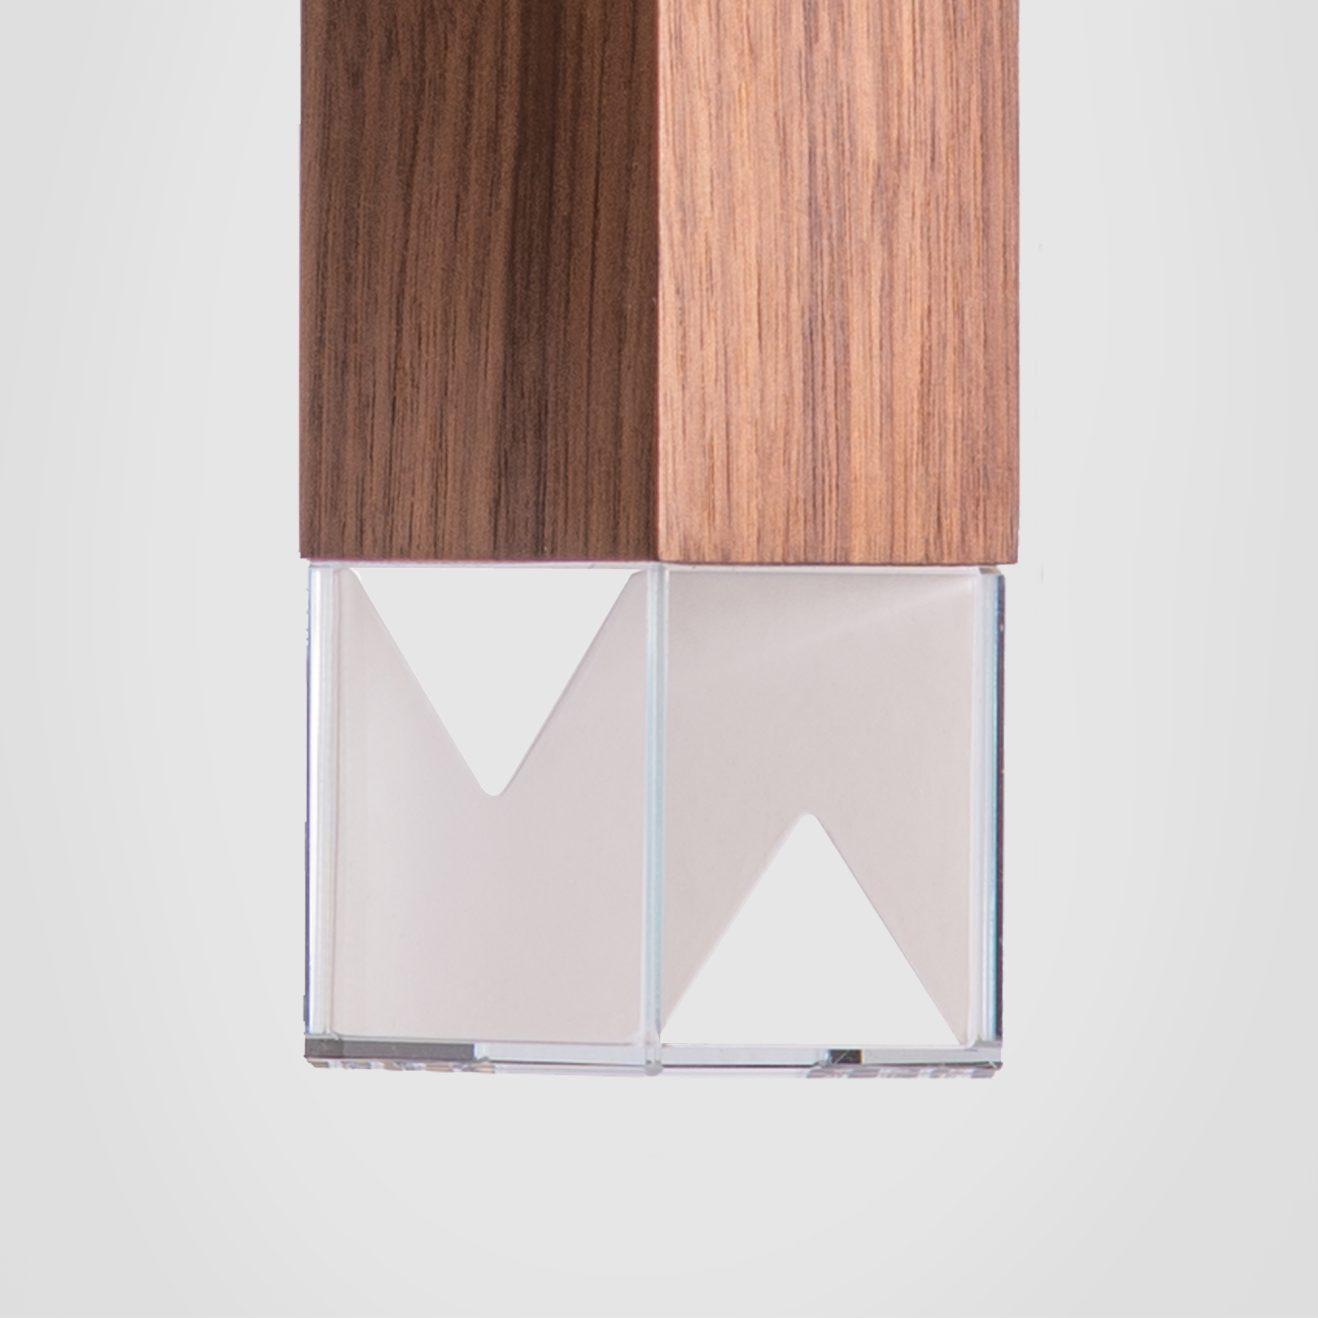 DuetChandelier-Formaminima-Wood-4